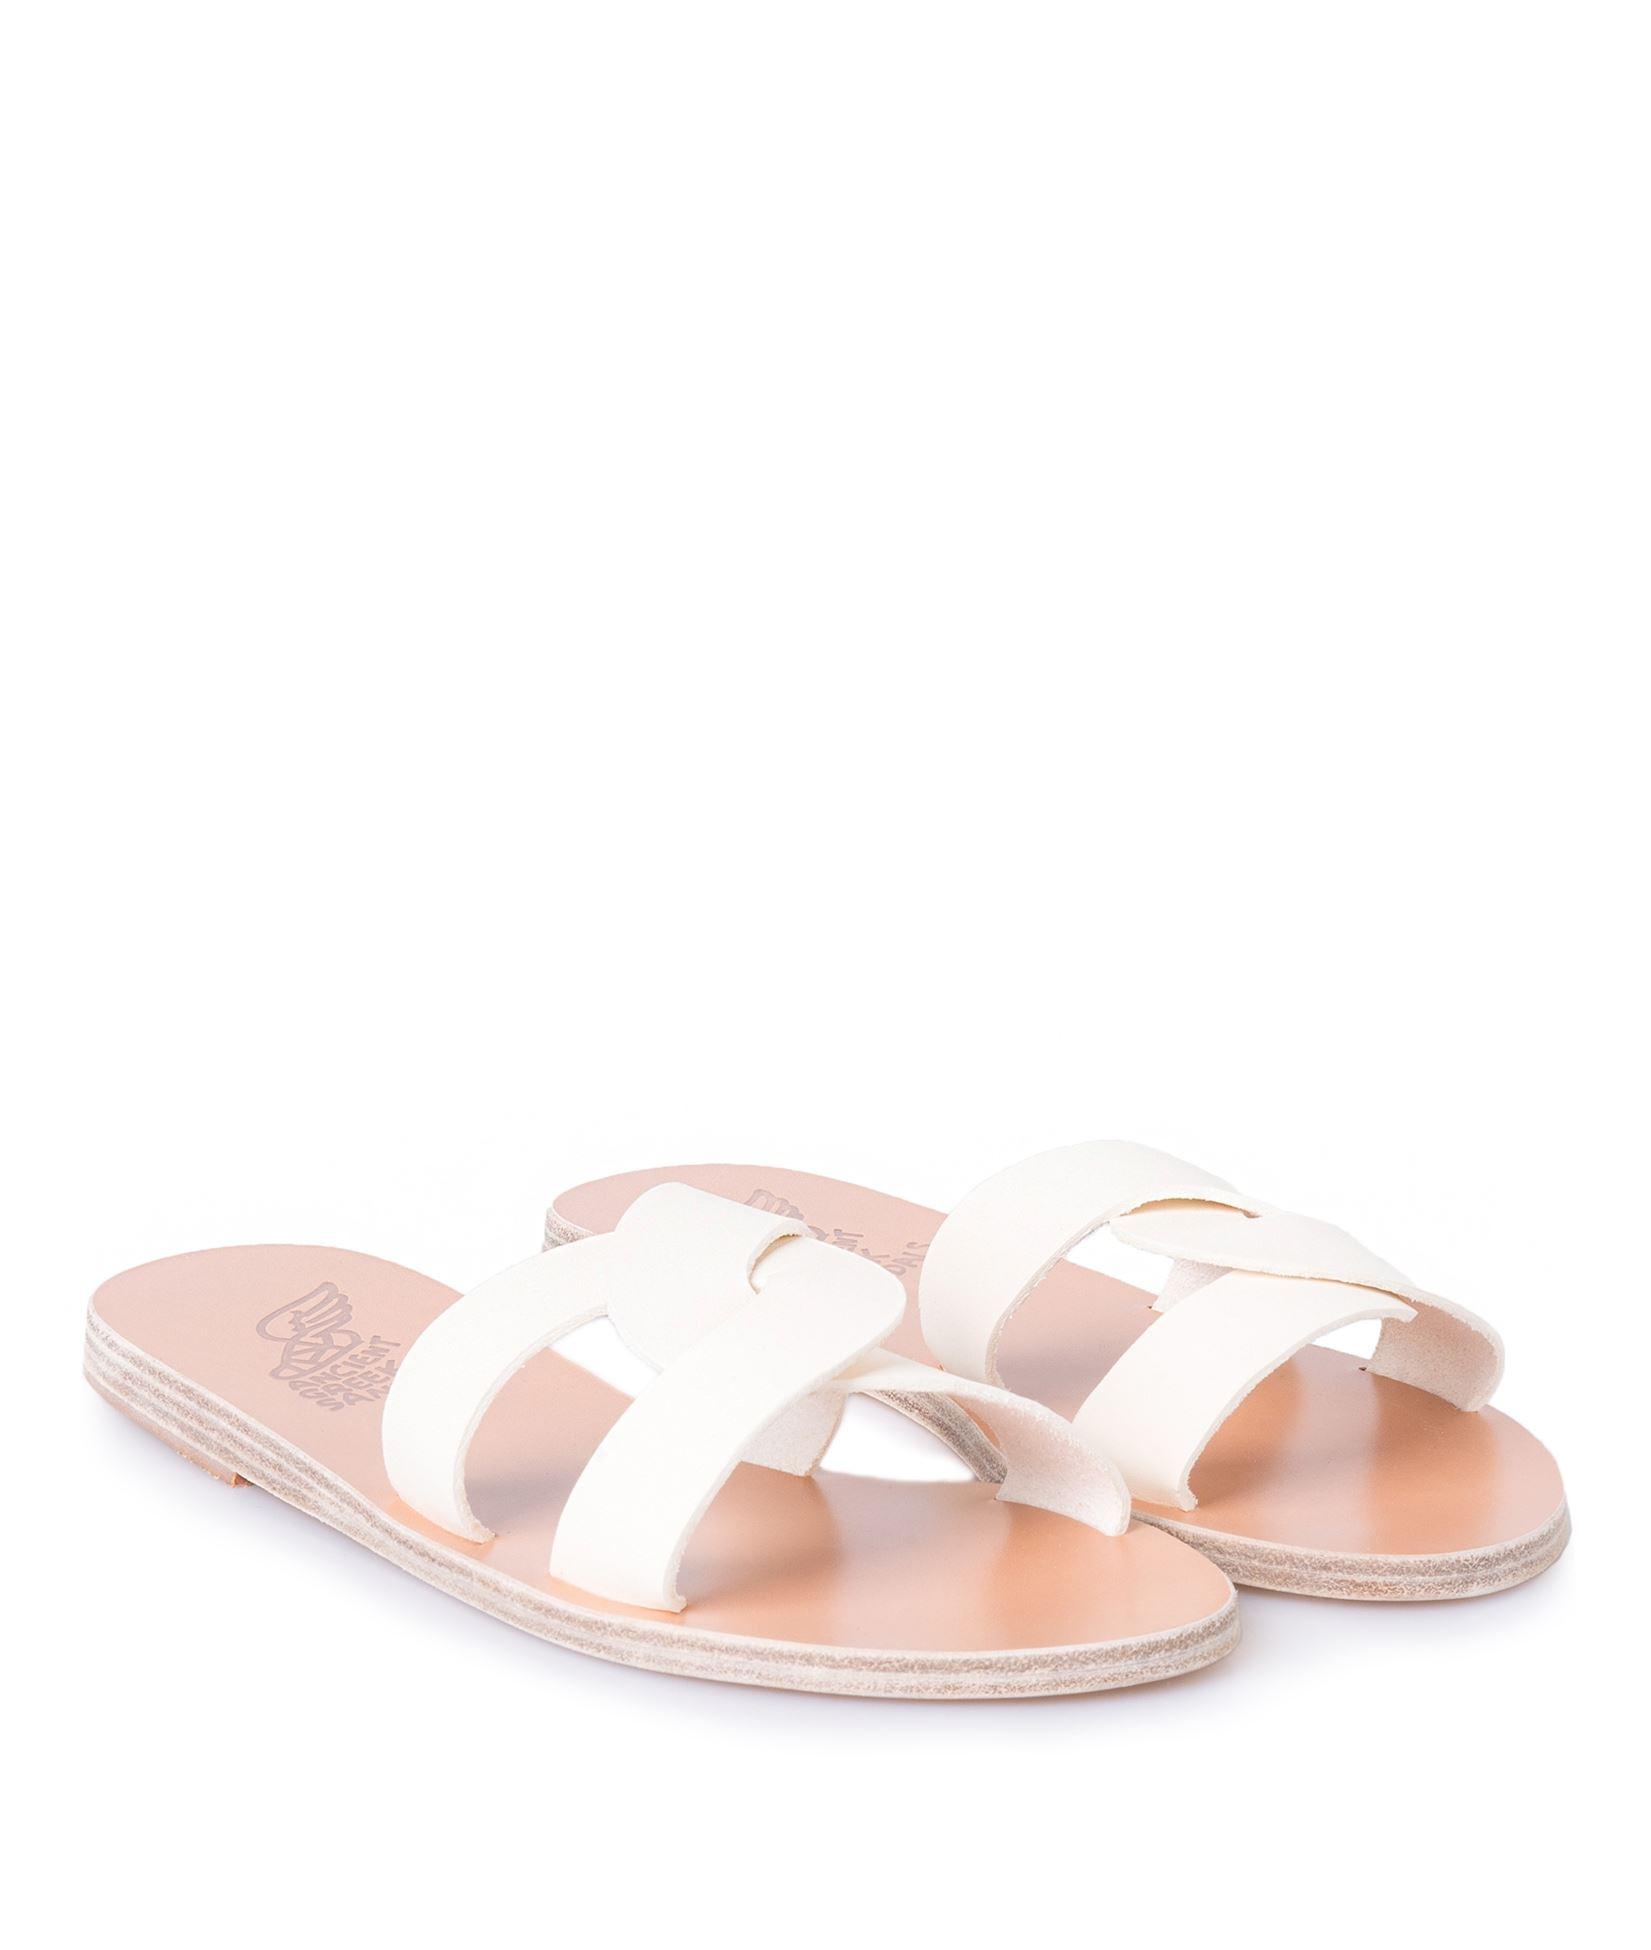 4371d44bced Ancient Greek Sandals Off White Desmos Cutout Slides < Everyday ...